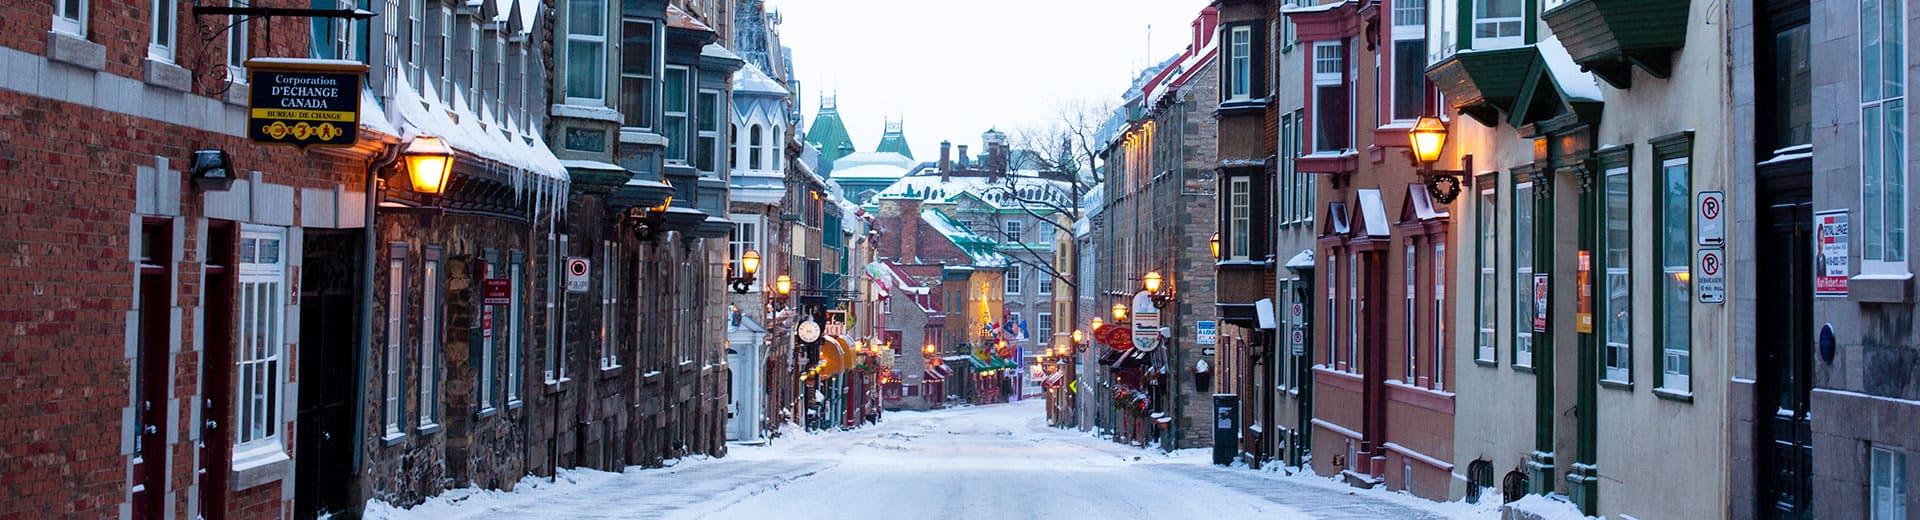 quebec city canada winter